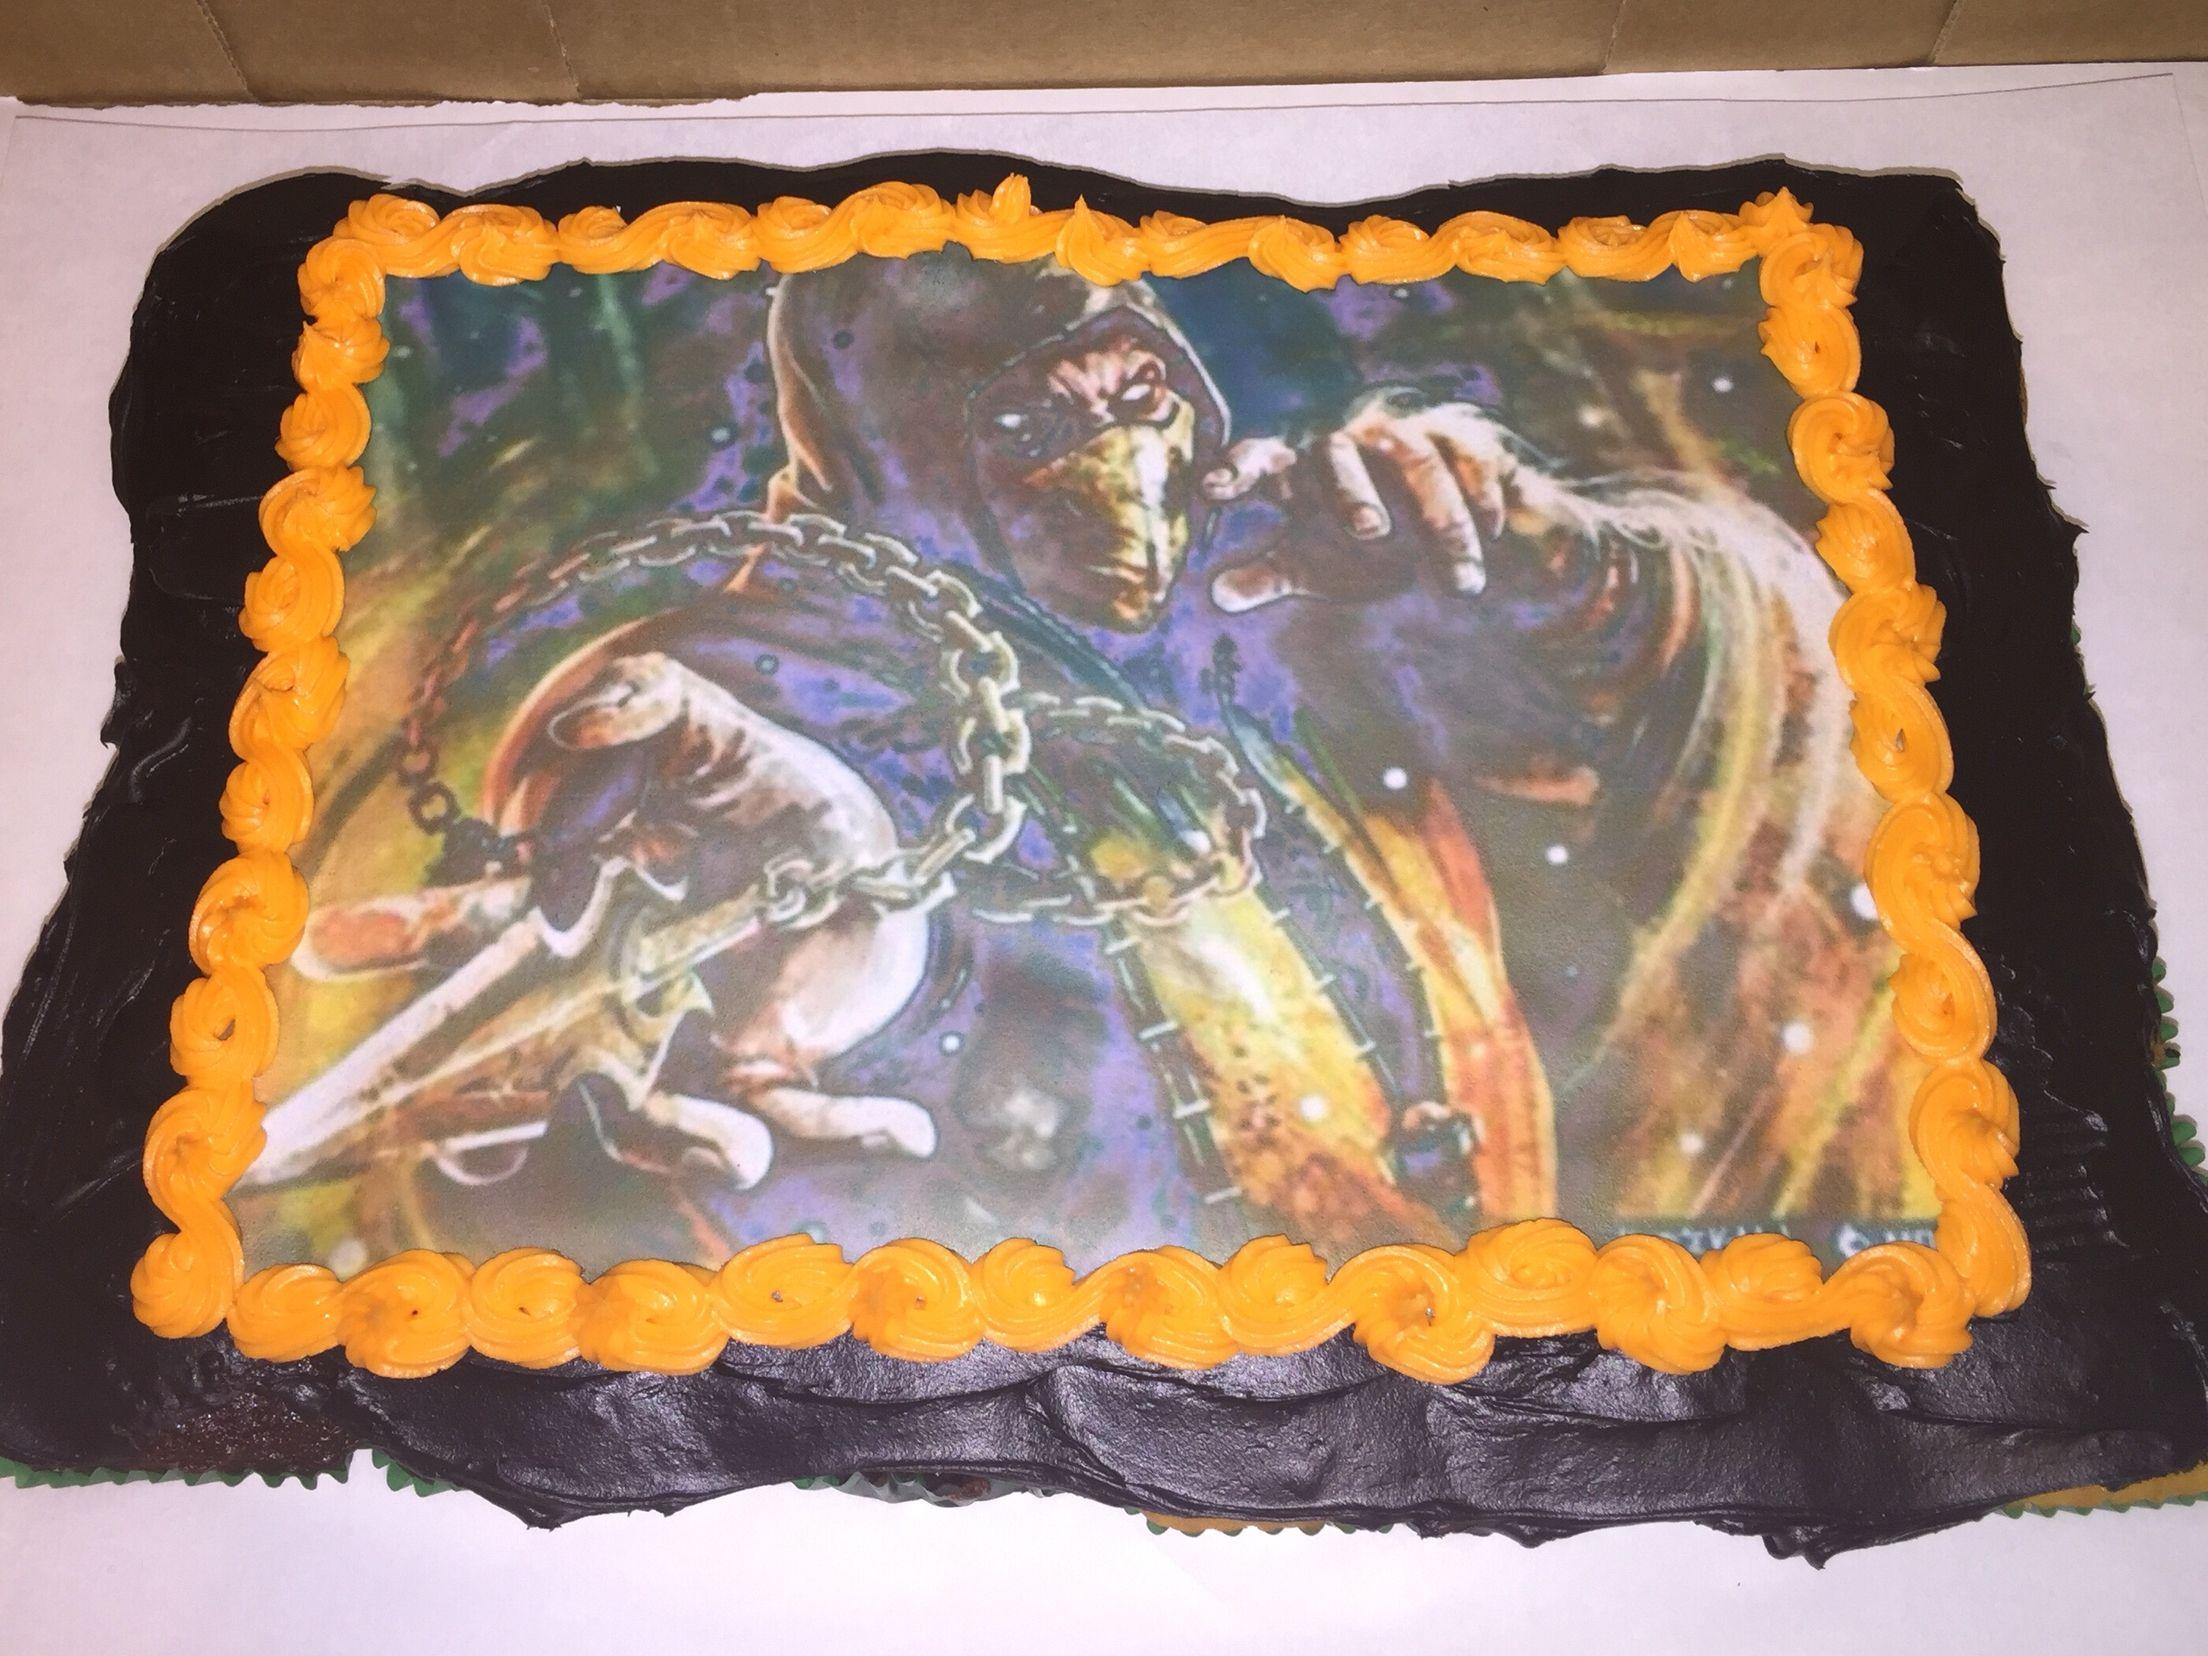 Cupcake cake with edible image edible images cupcake